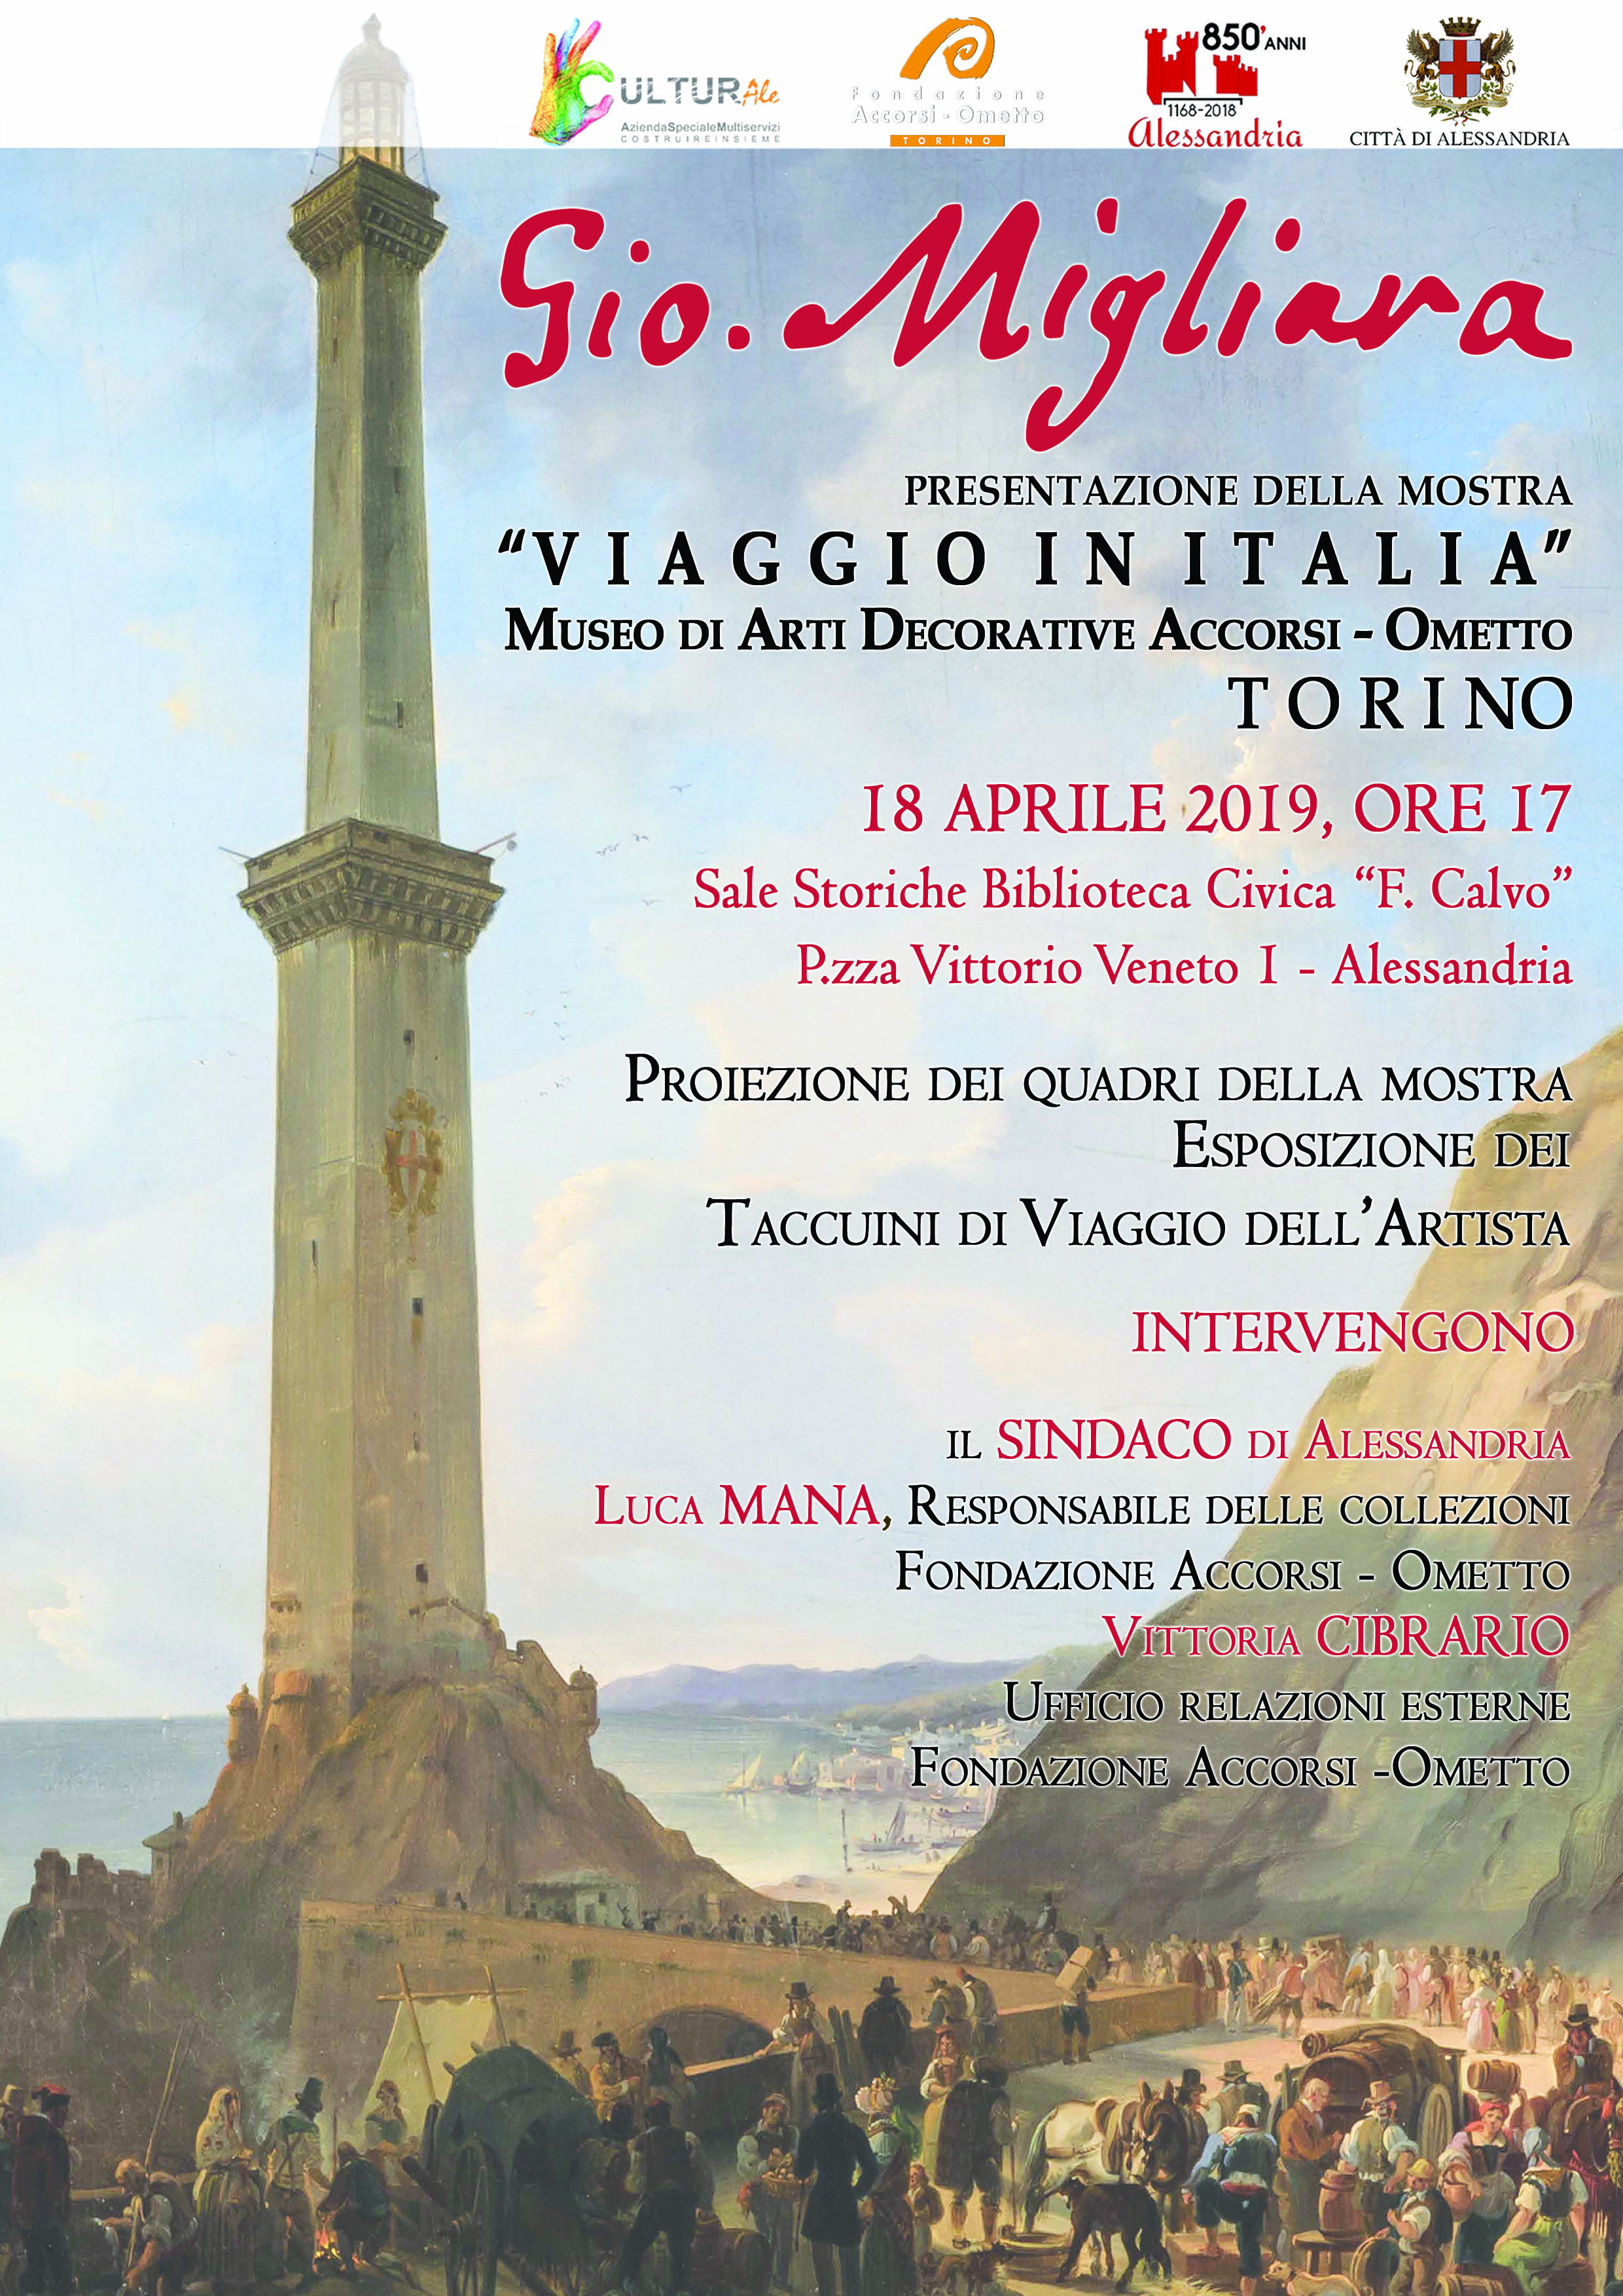 Giovanni Migliara_Alessandria 18-04-2019.jpg